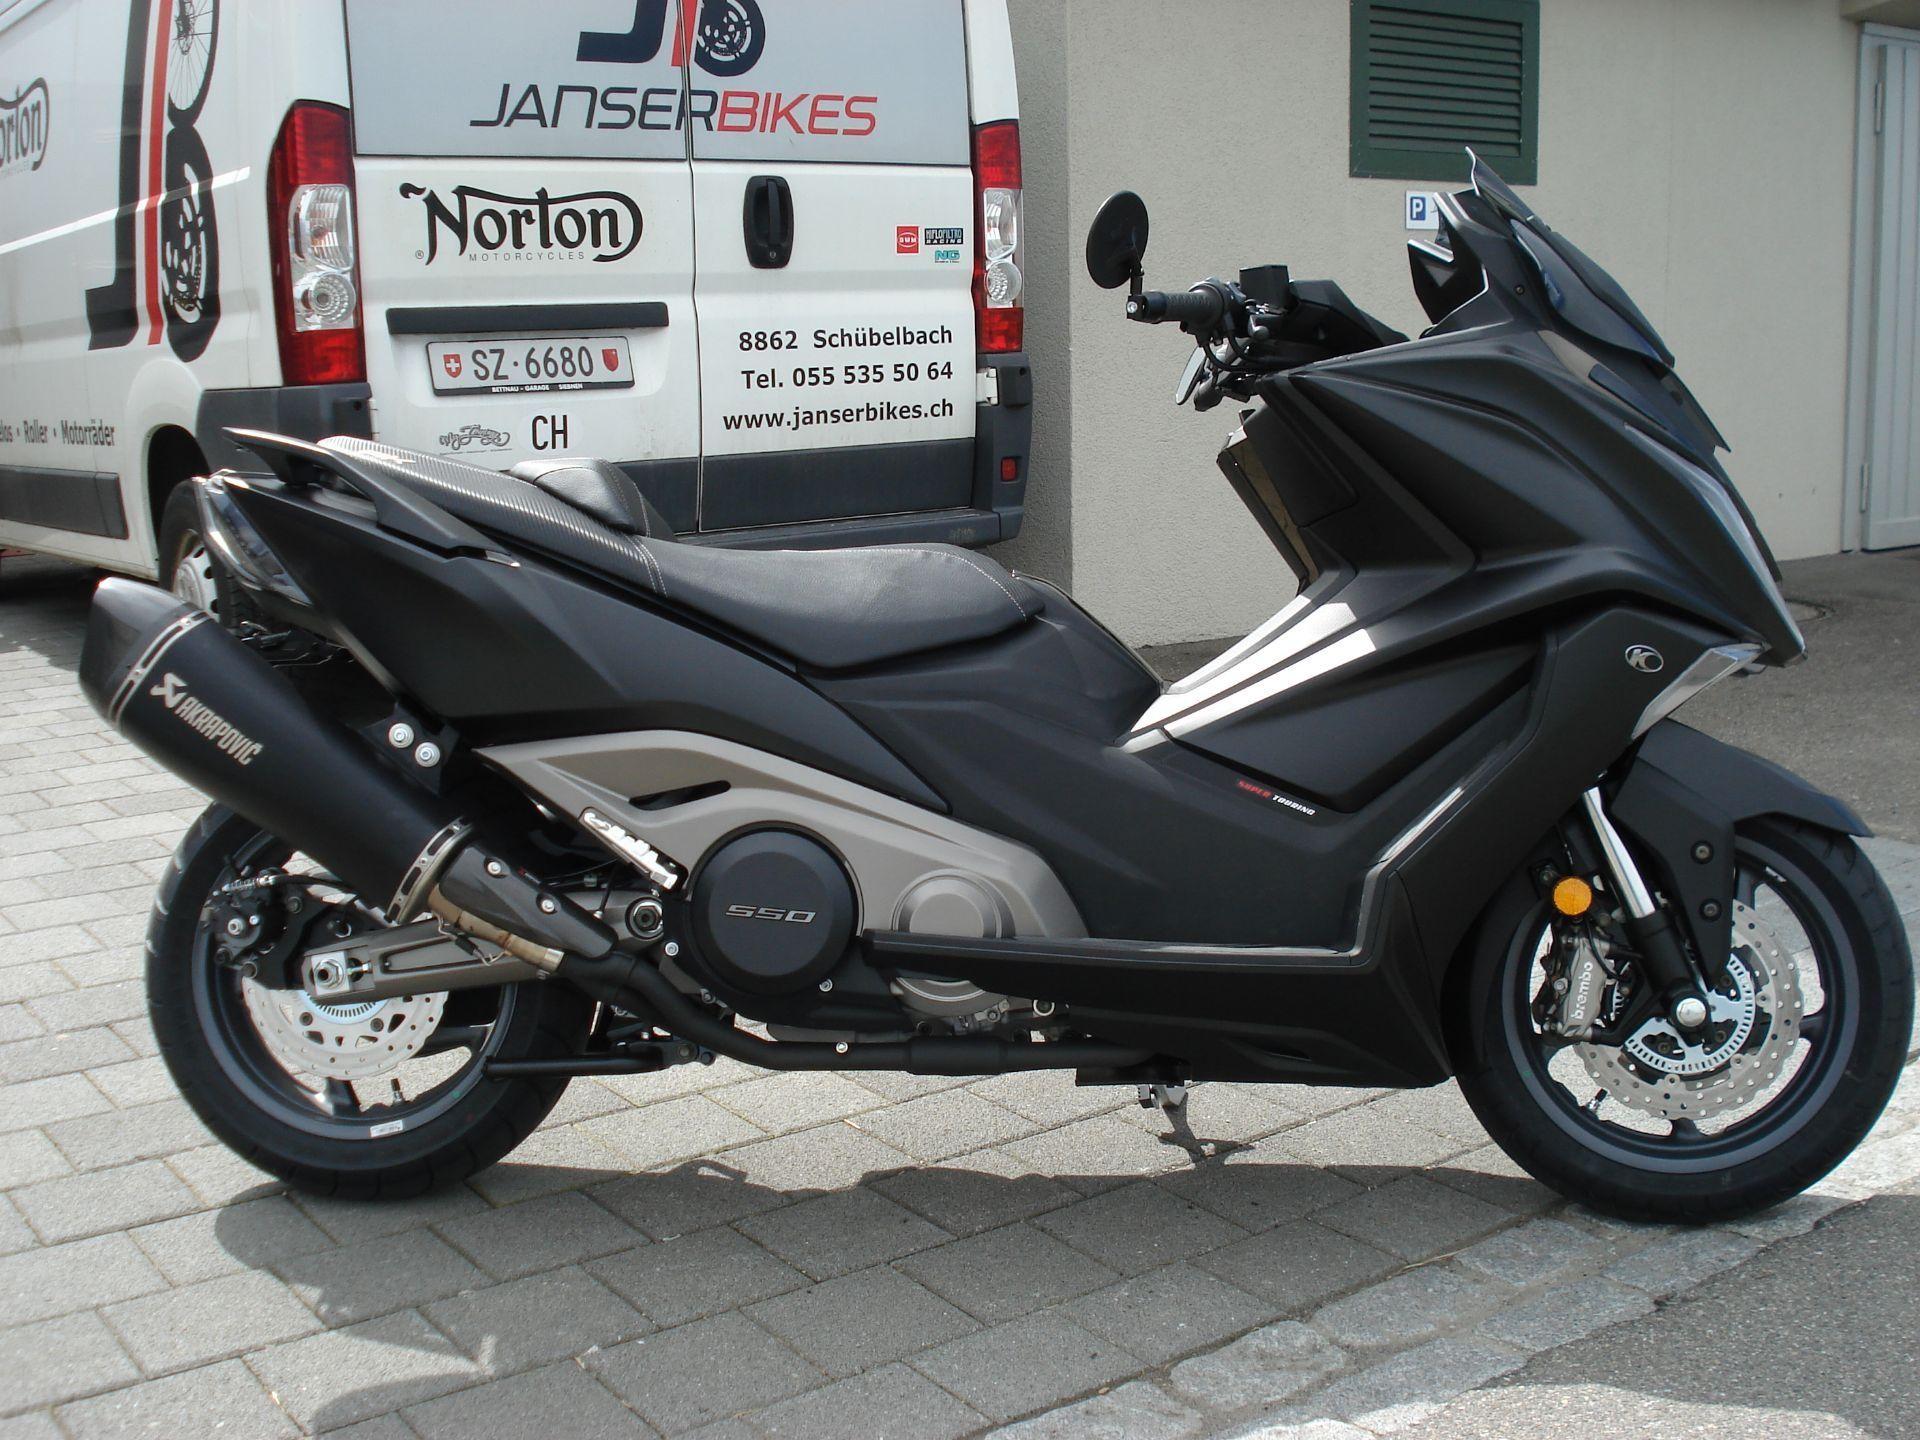 moto neuve acheter kymco ak 550 janser bikes gmbh sch belbach. Black Bedroom Furniture Sets. Home Design Ideas